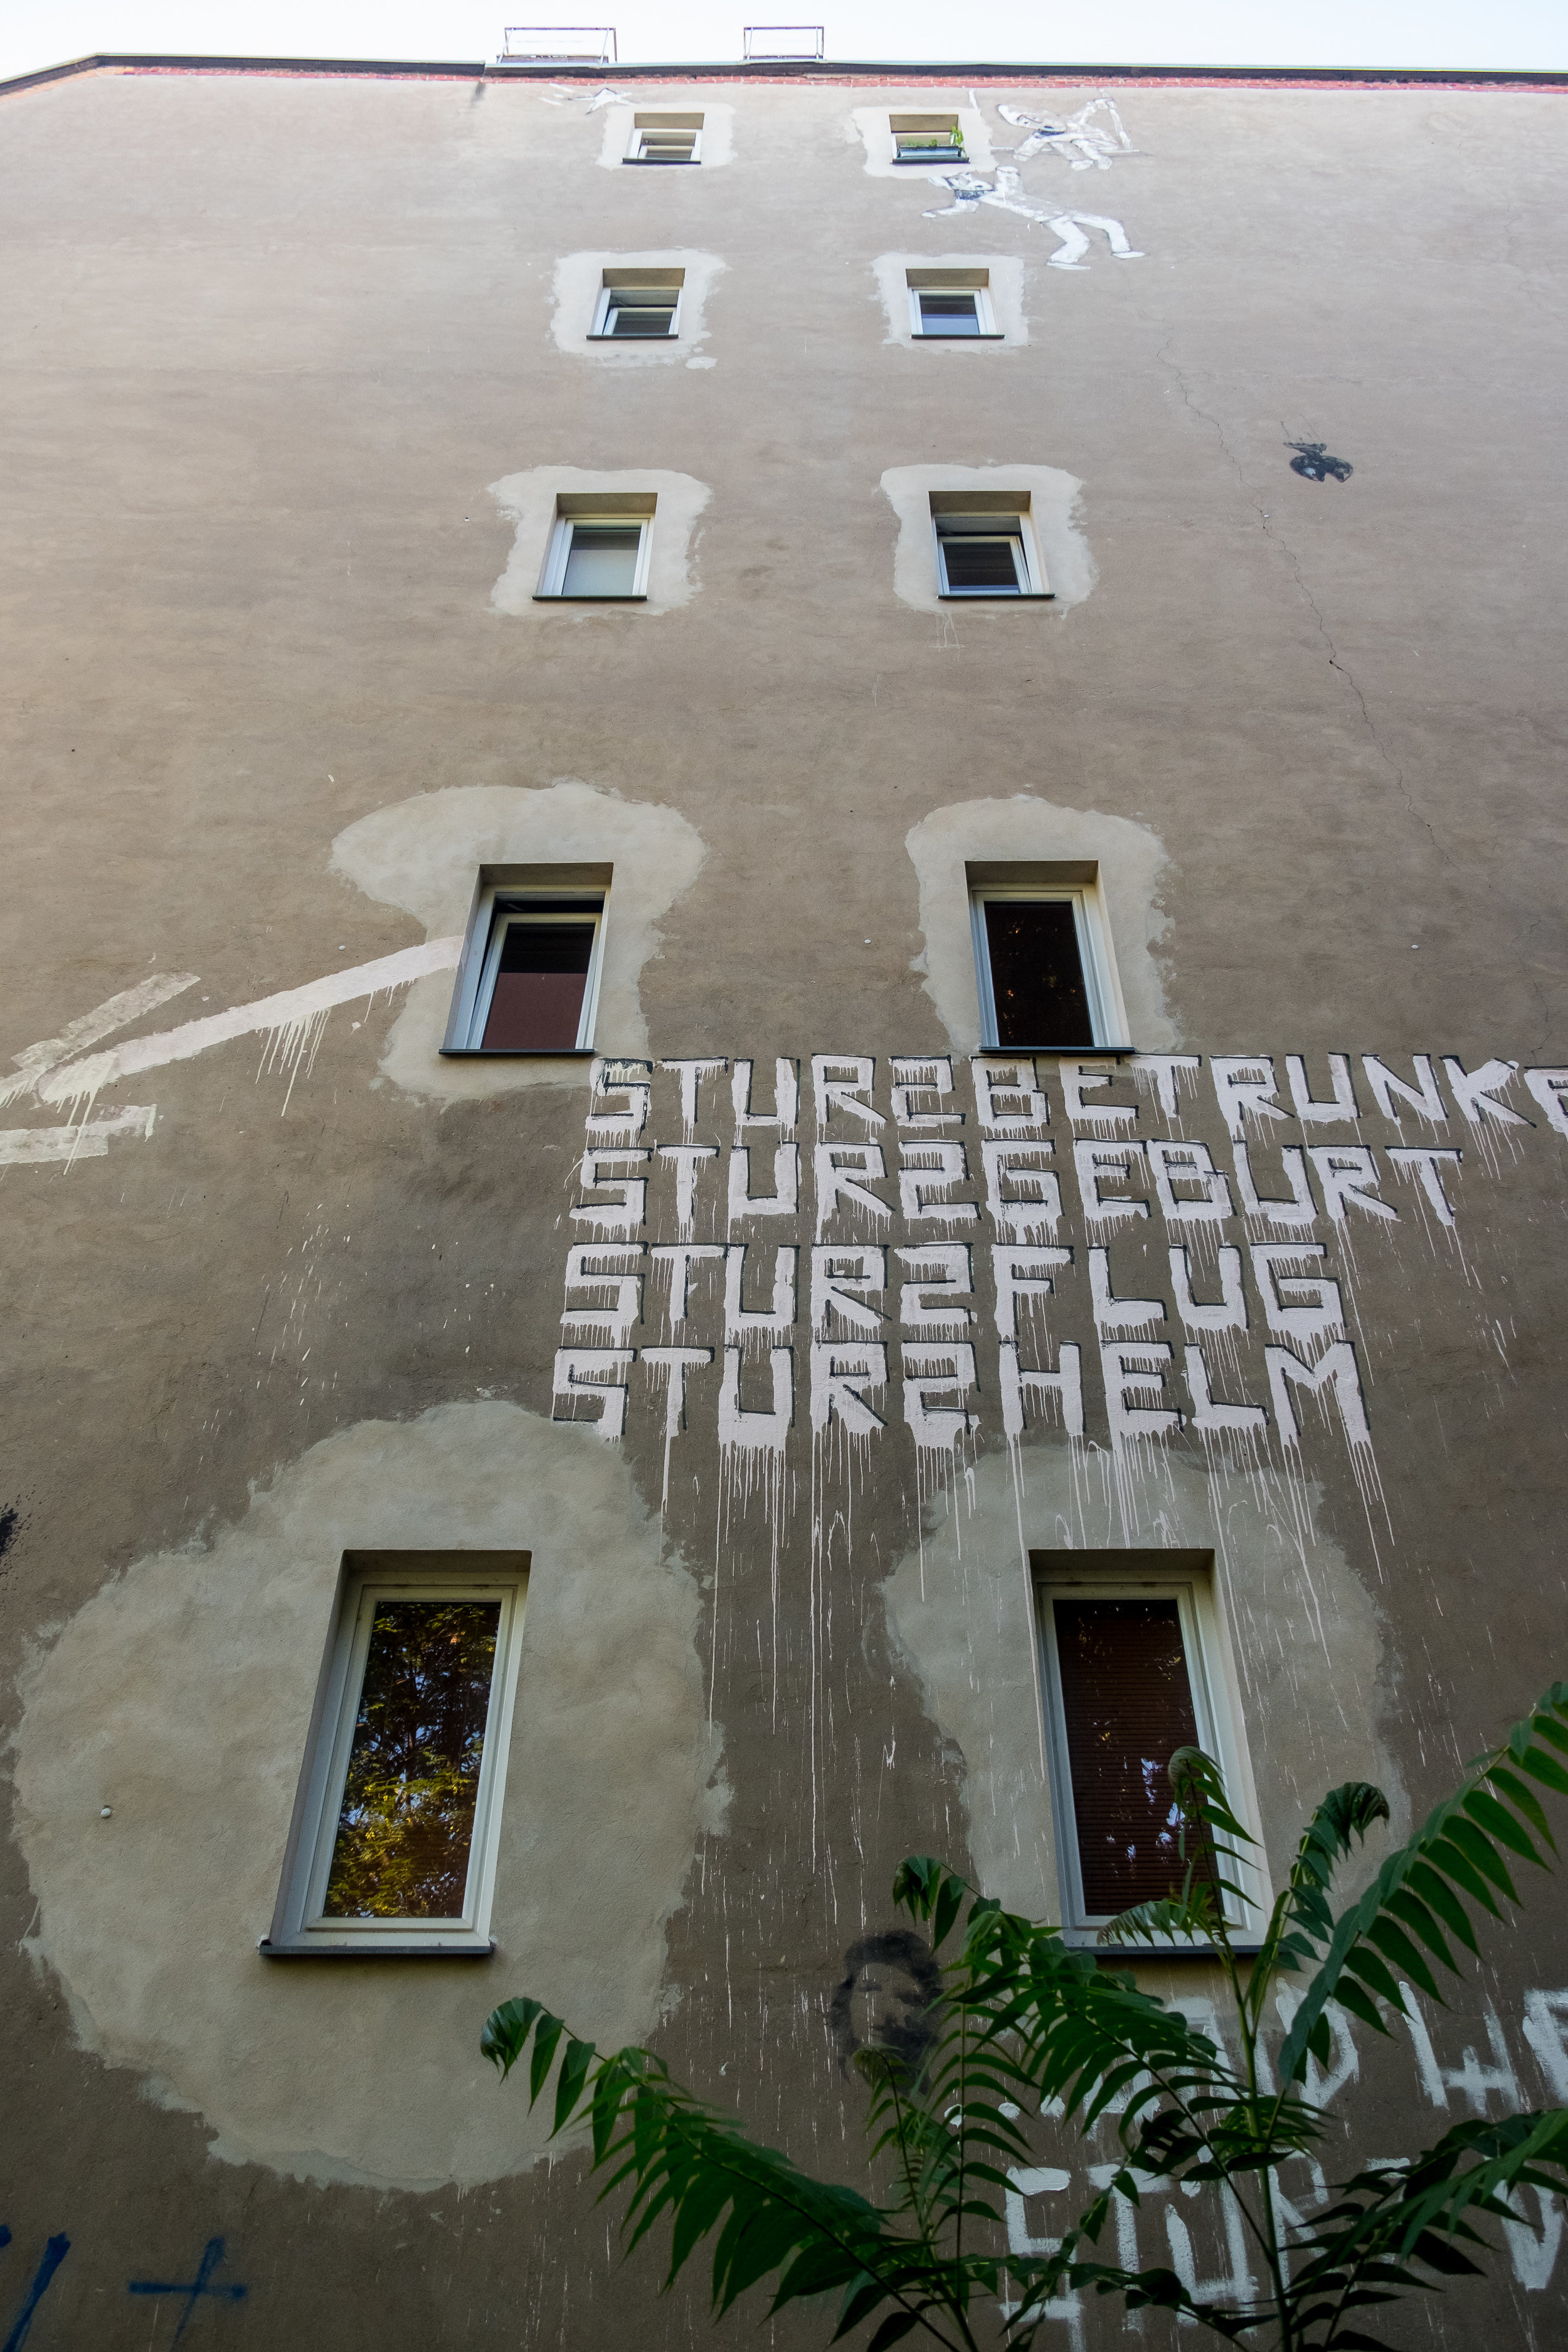 Dietrich-Bonhoeffer-Strasse